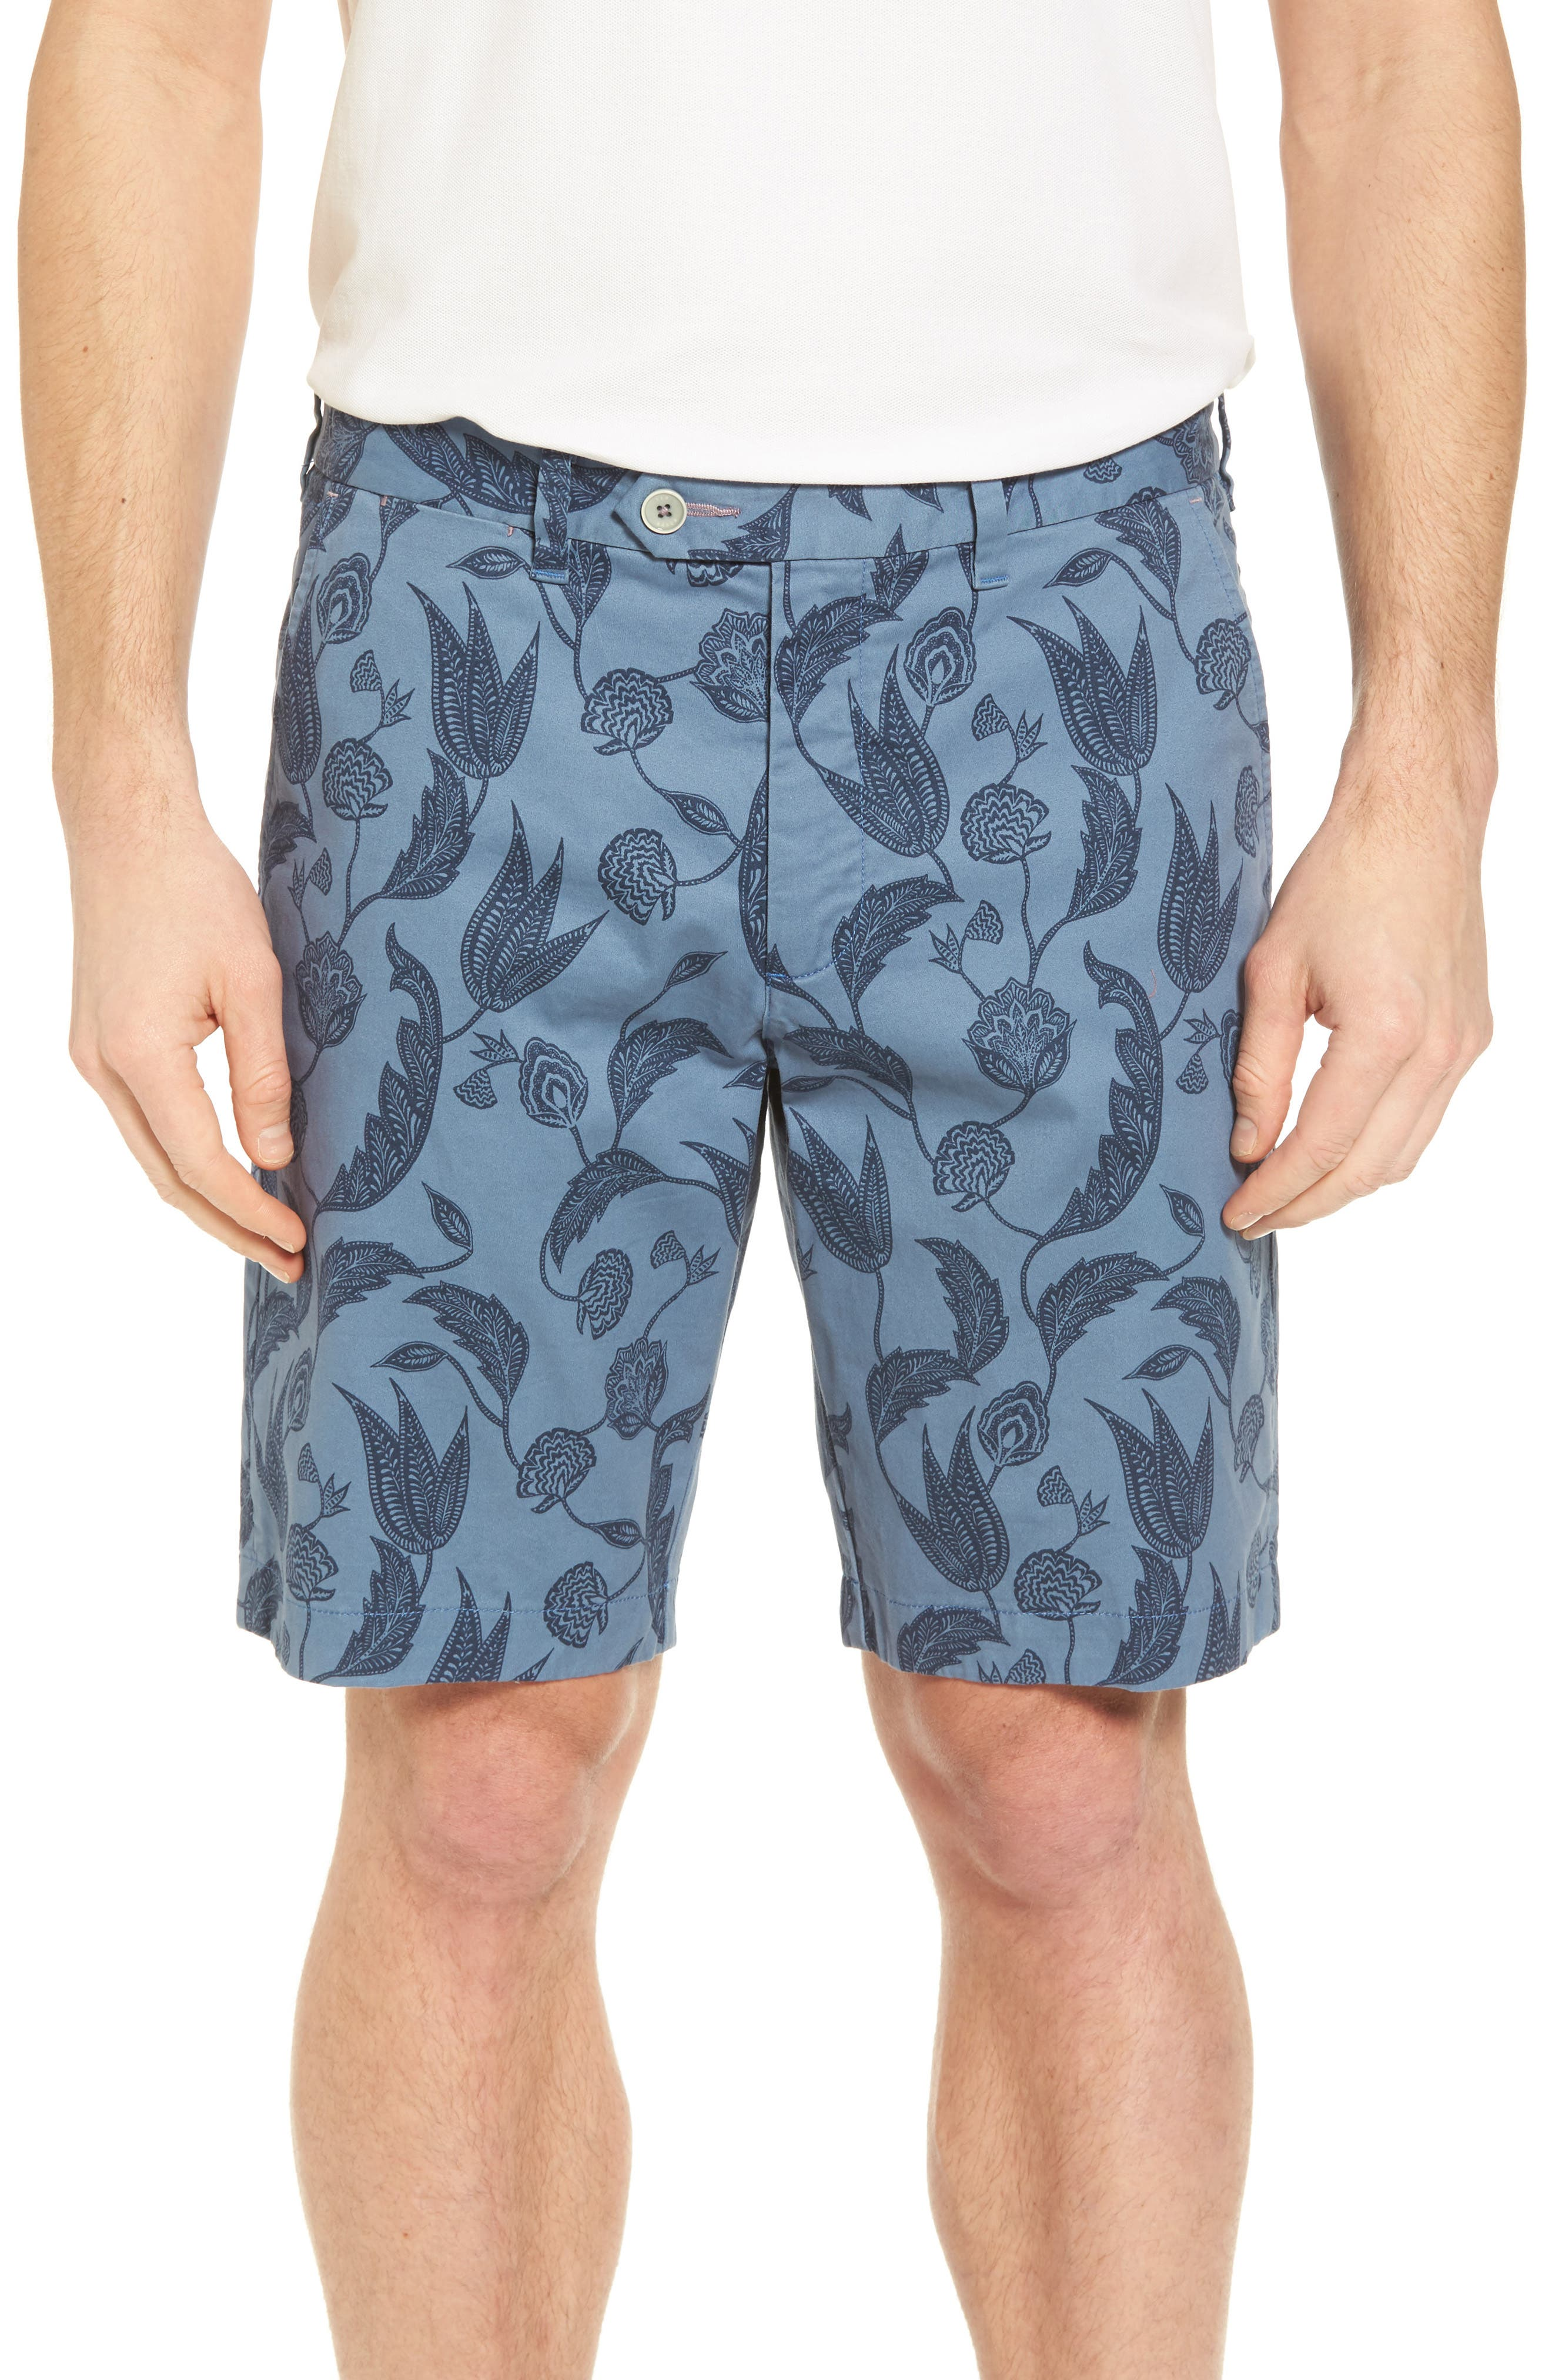 Uniprin Trim Fit Floral Golf Shorts,                         Main,                         color, 430